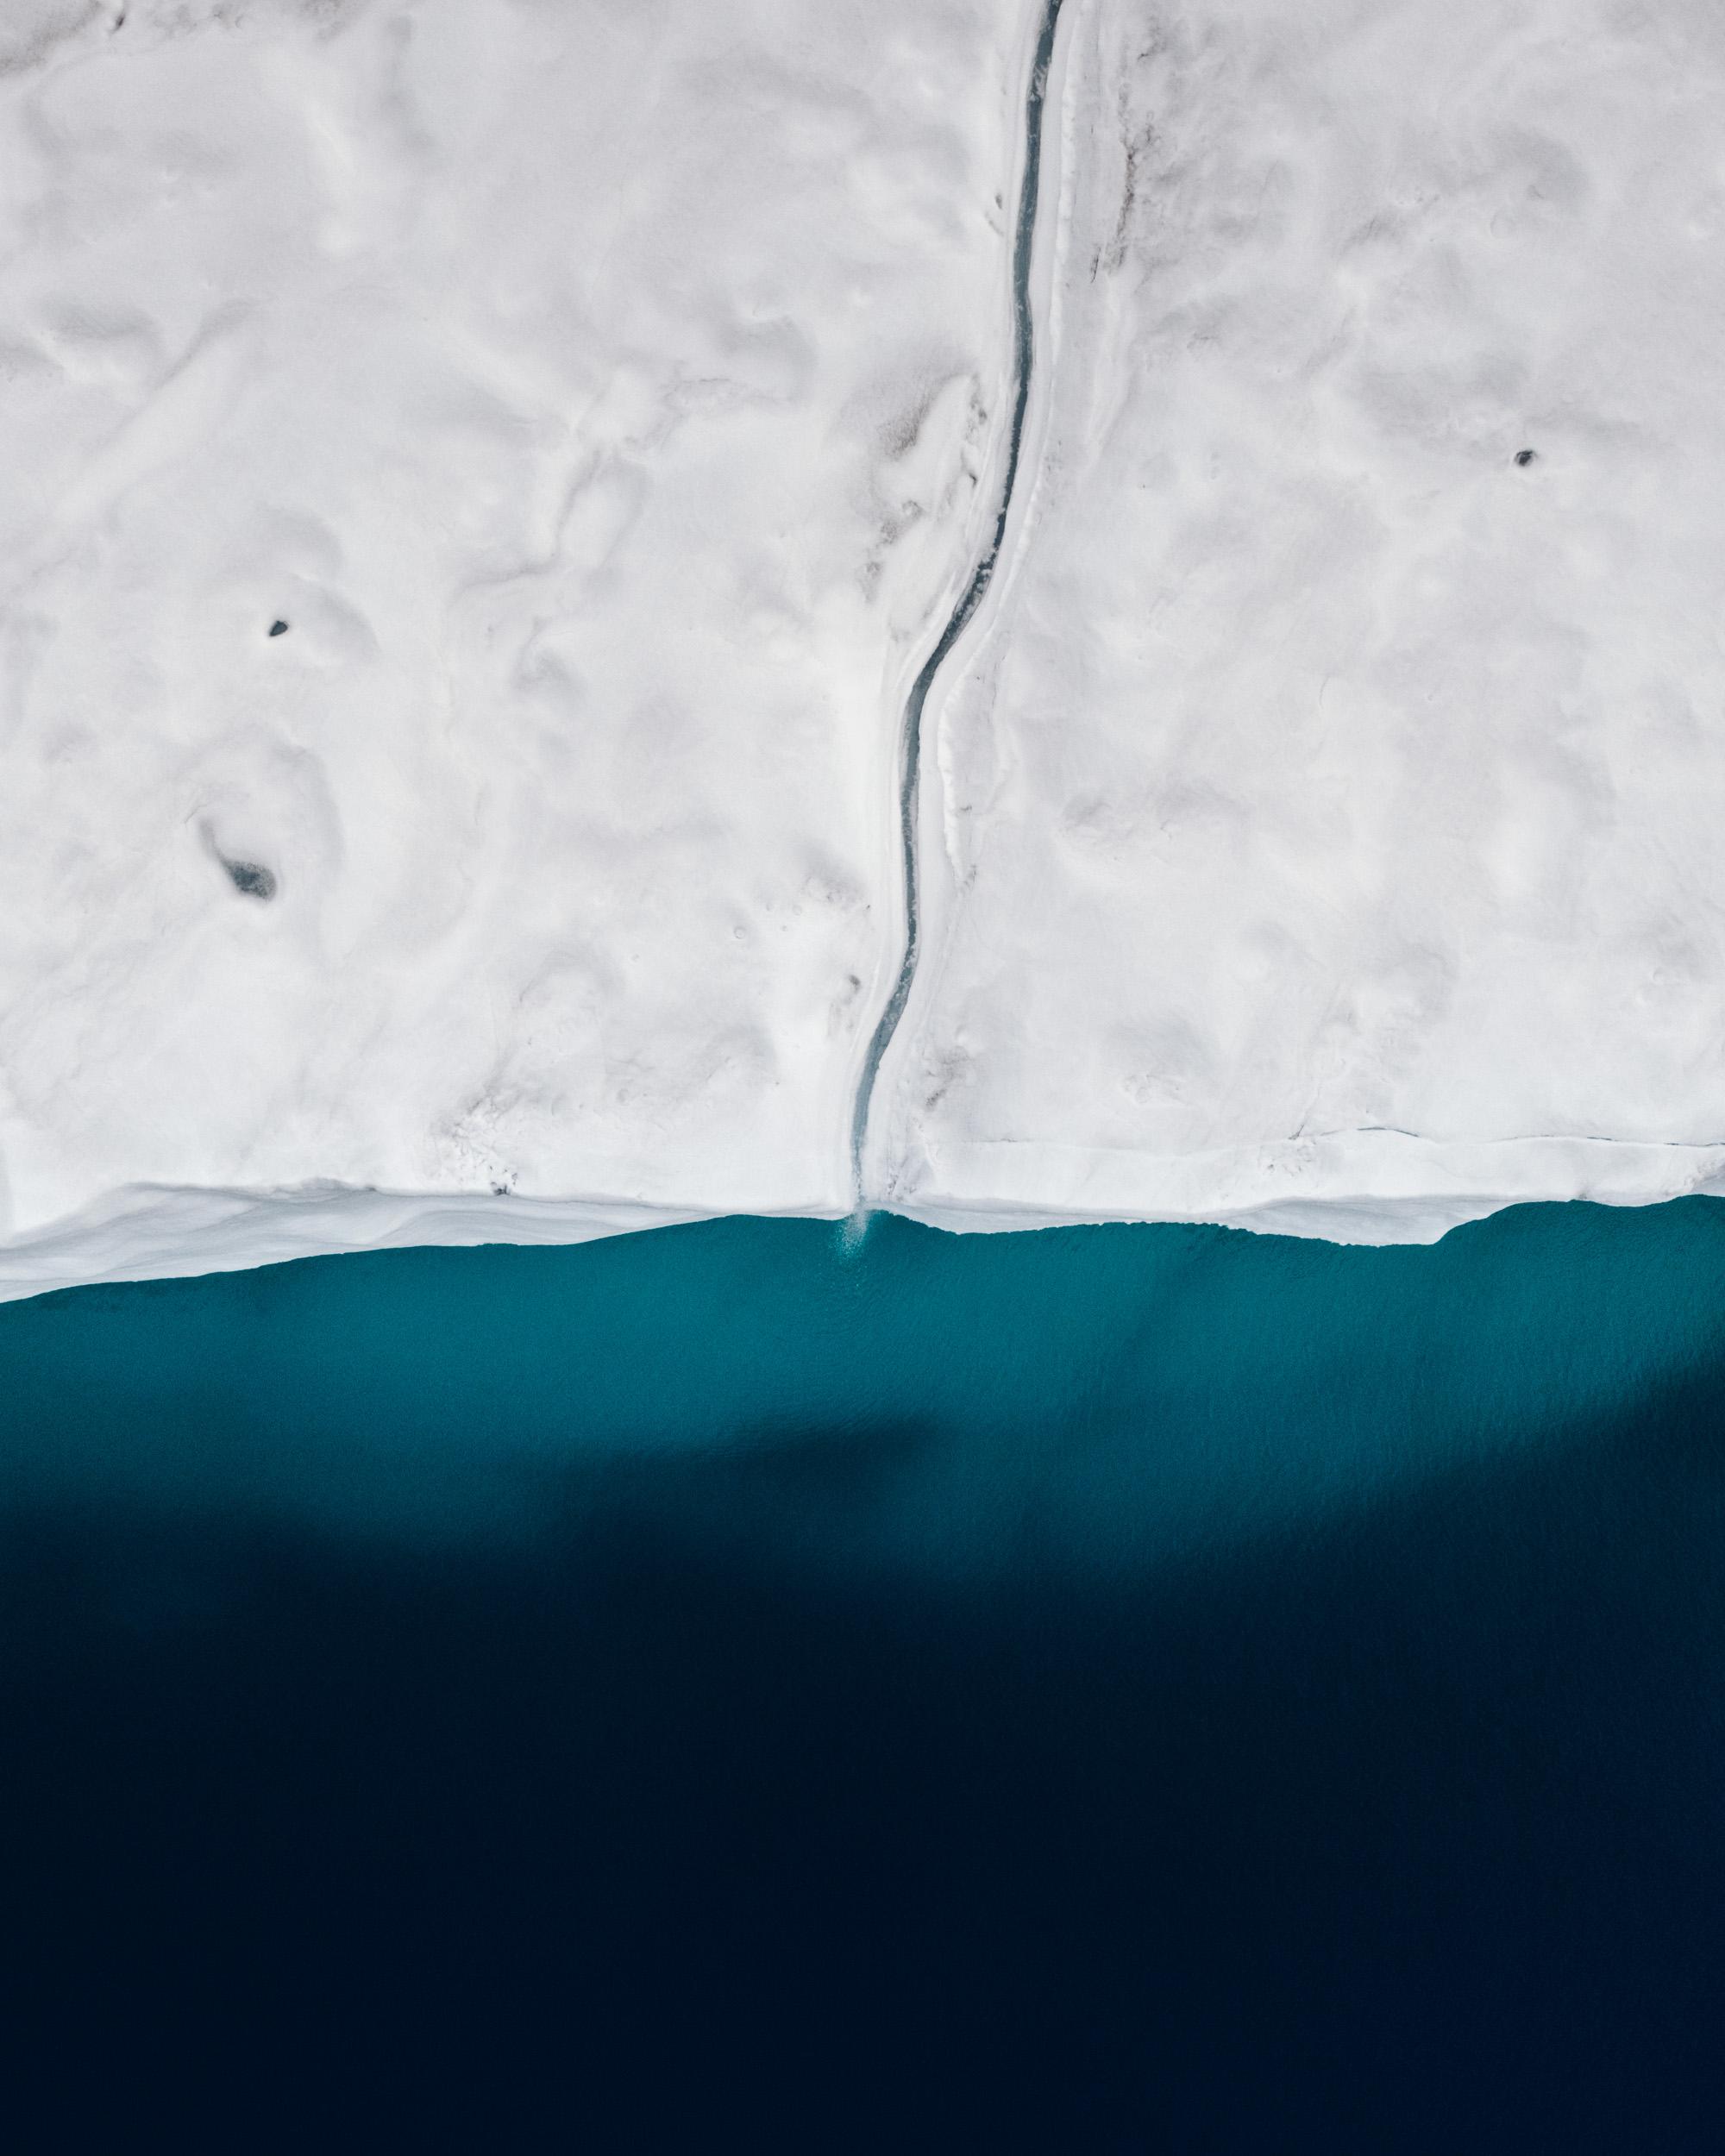 Aerial of Glacier front Bråsvellbreen in Svalbard and Jan Mayen, Norway